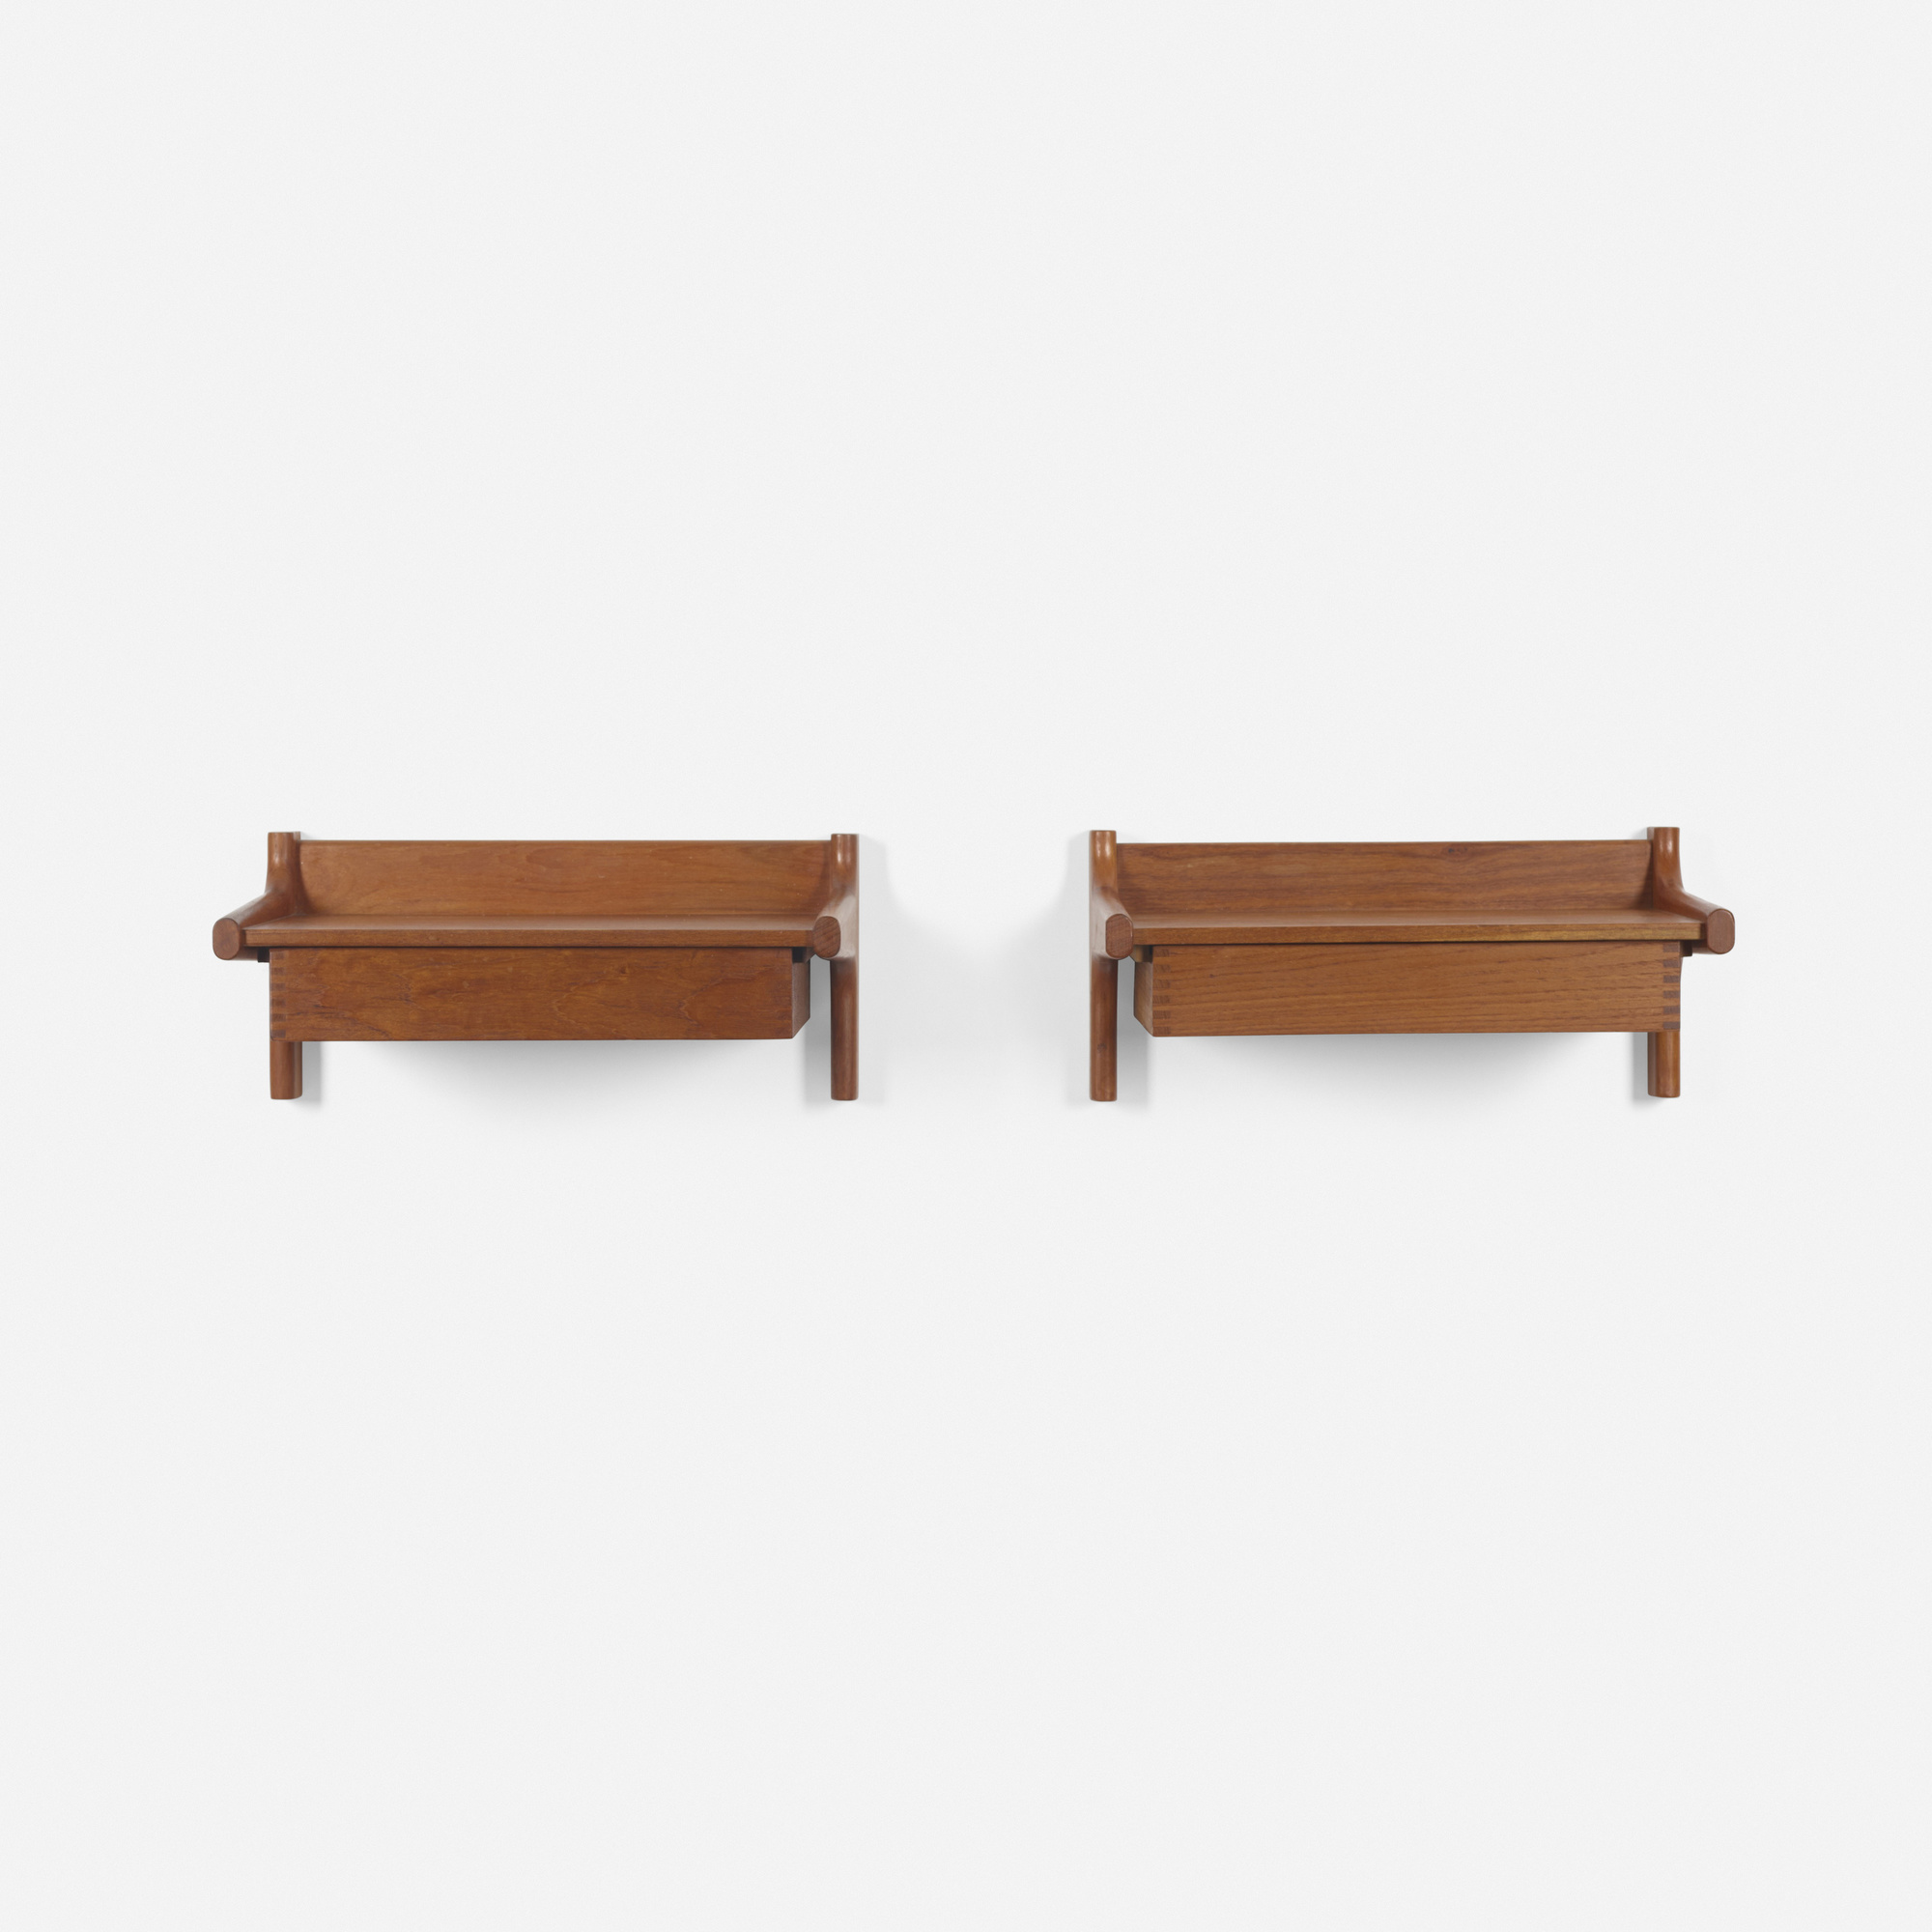 238: Børge Mogensen / wall-mounted nightstands, pair (2 of 2)